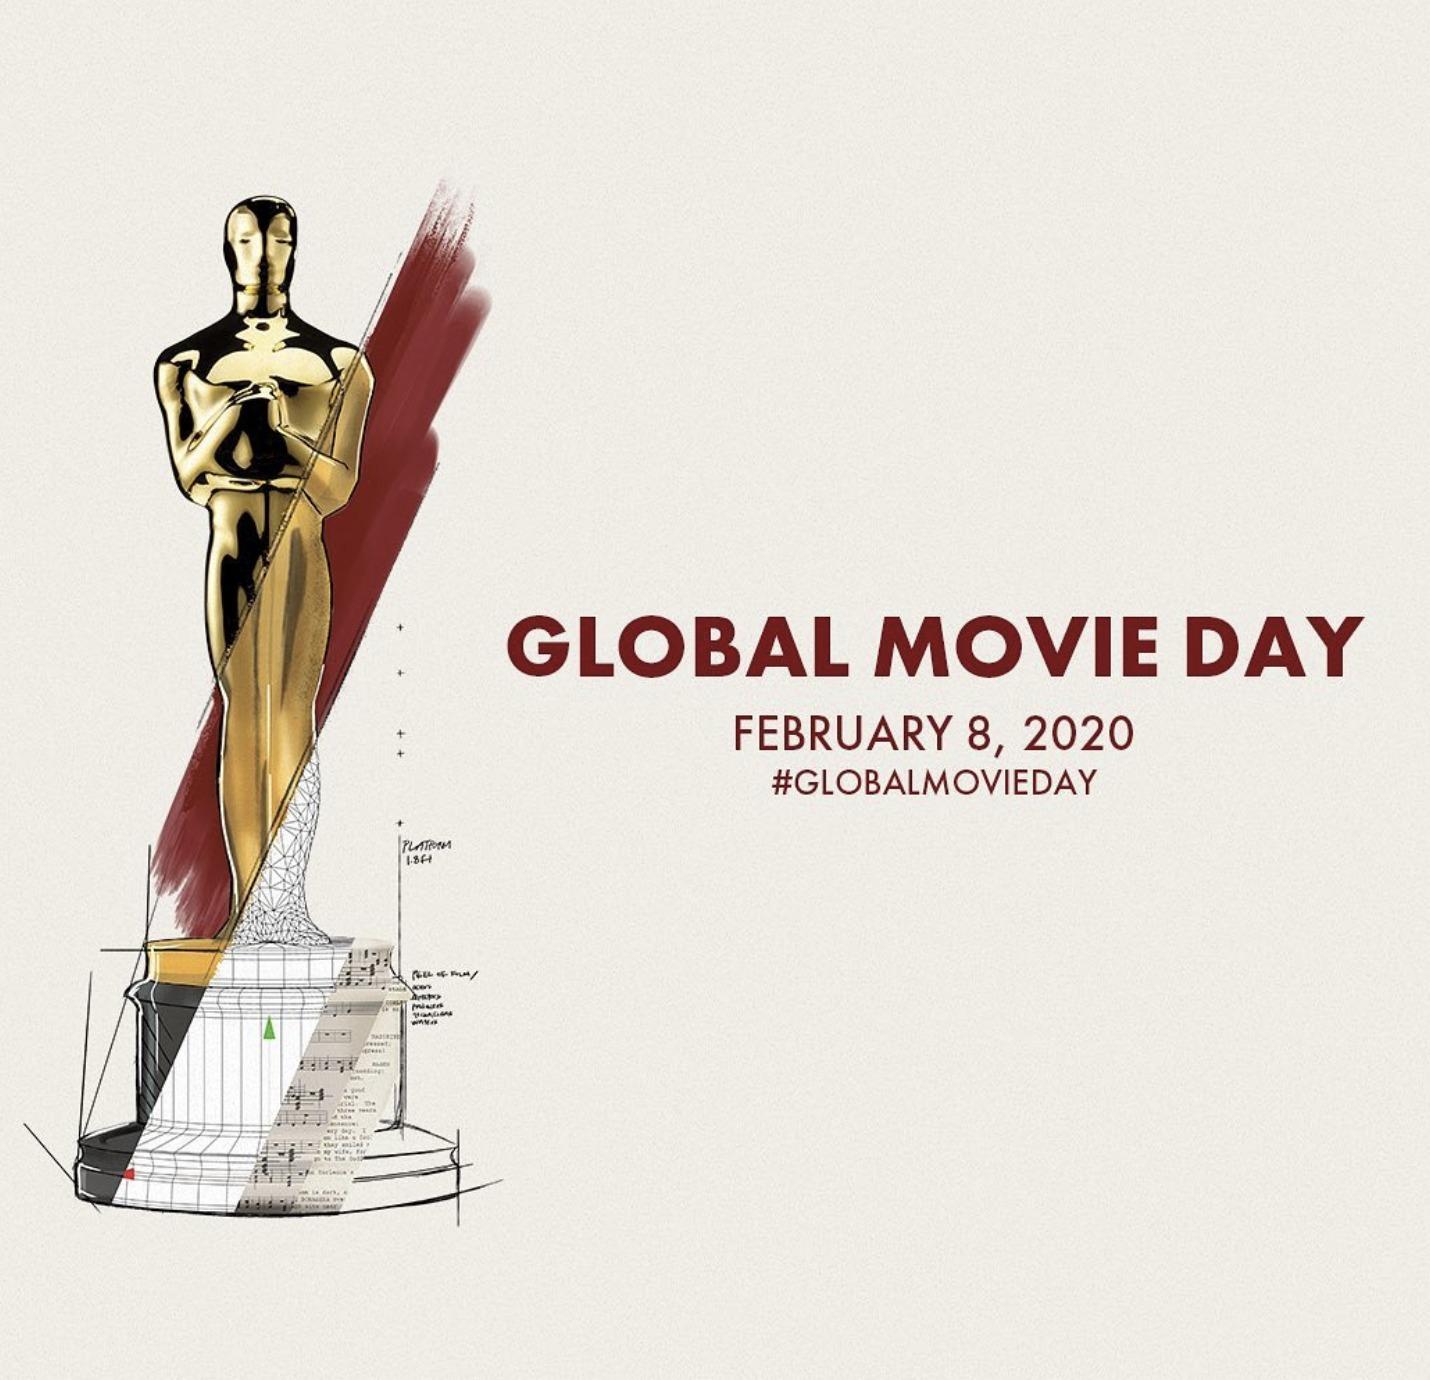 GlobalMovieDay